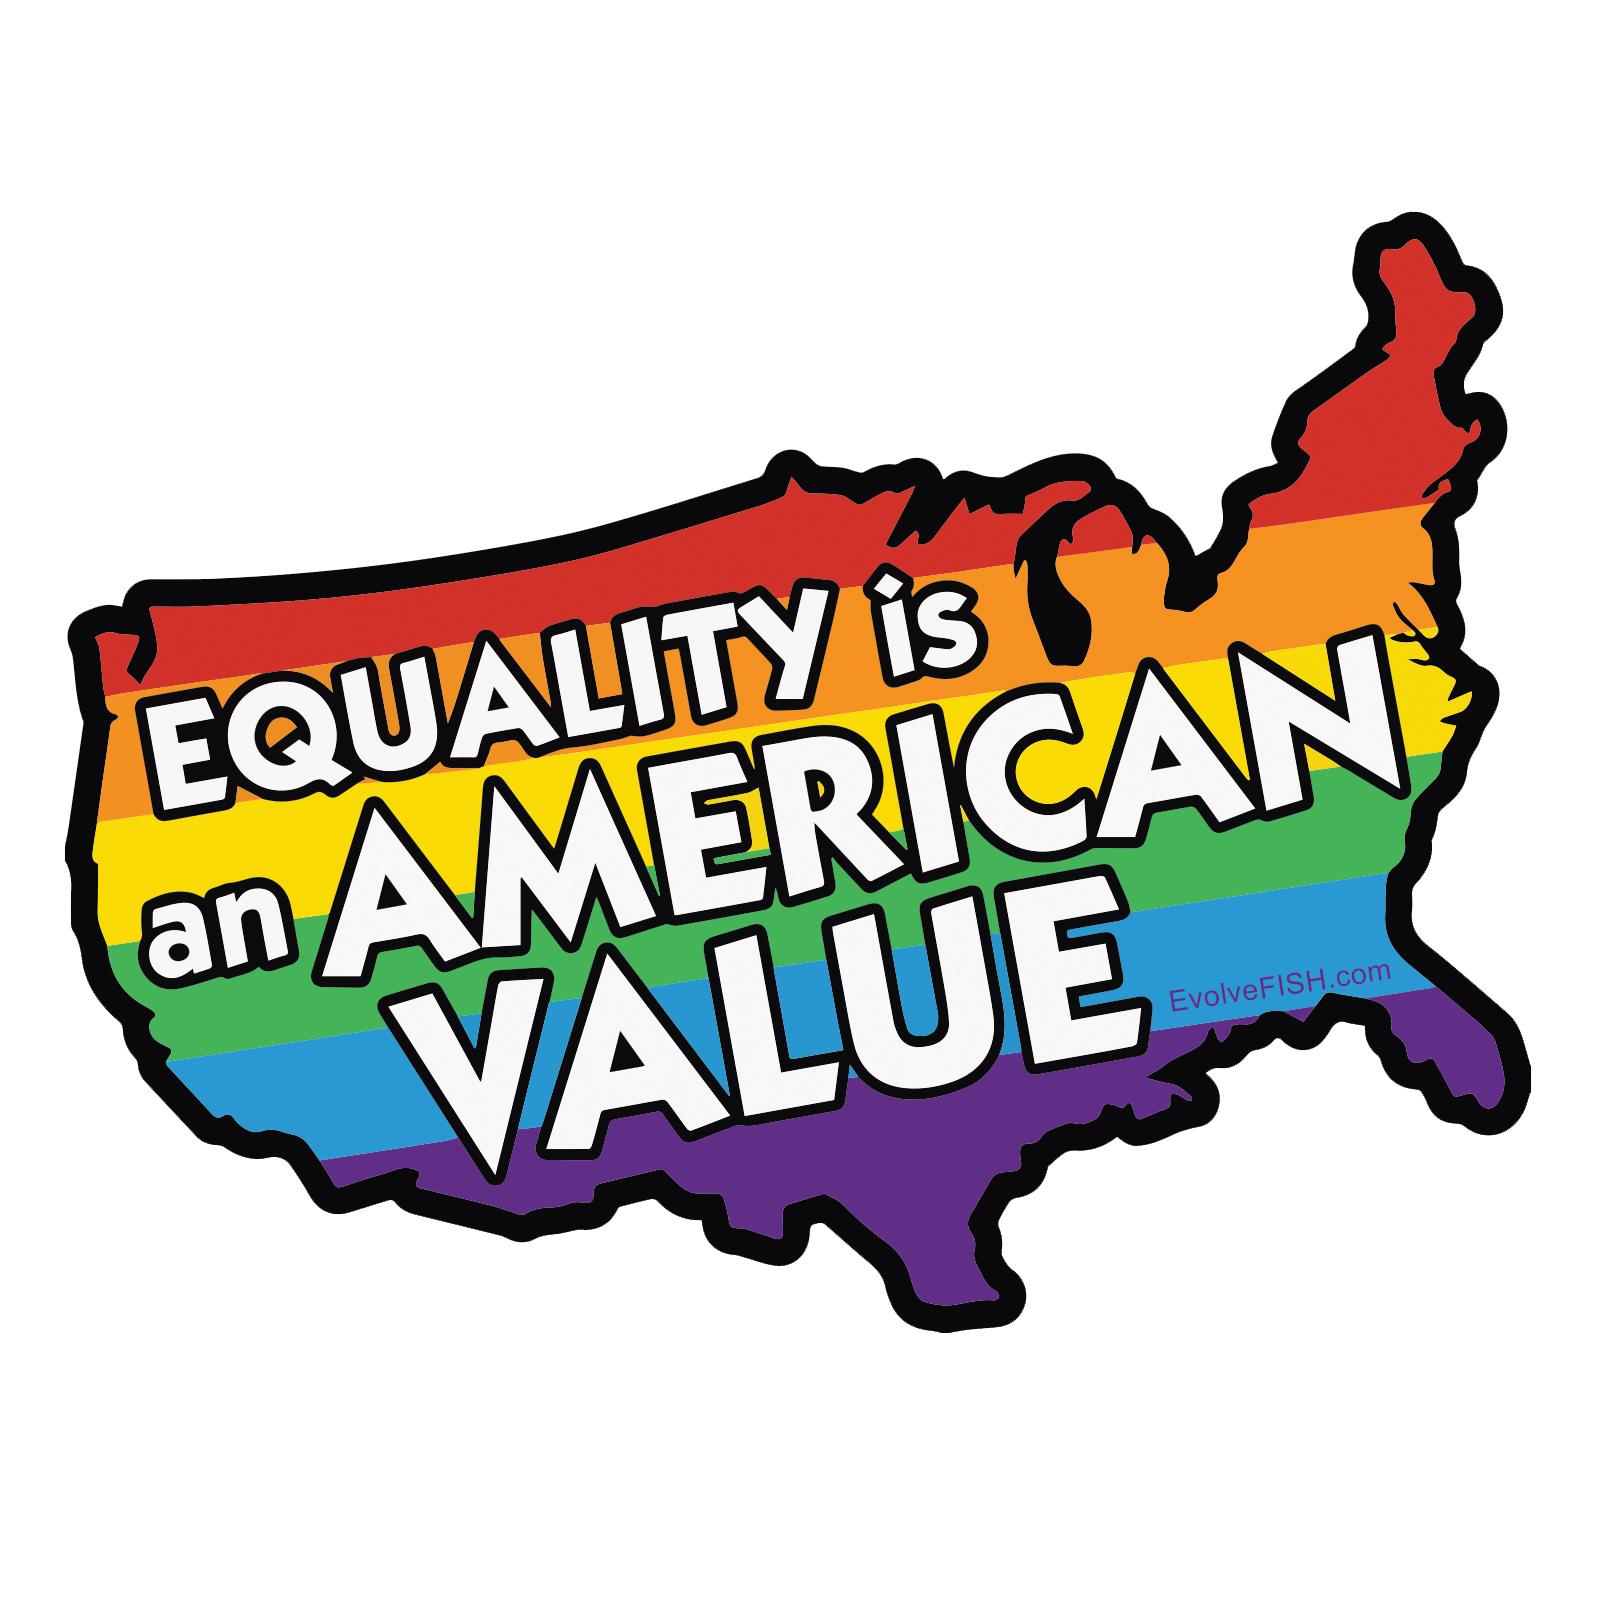 Equality Sticker Sticker Vinyl Bumper Sticker Decal Waterproof 5